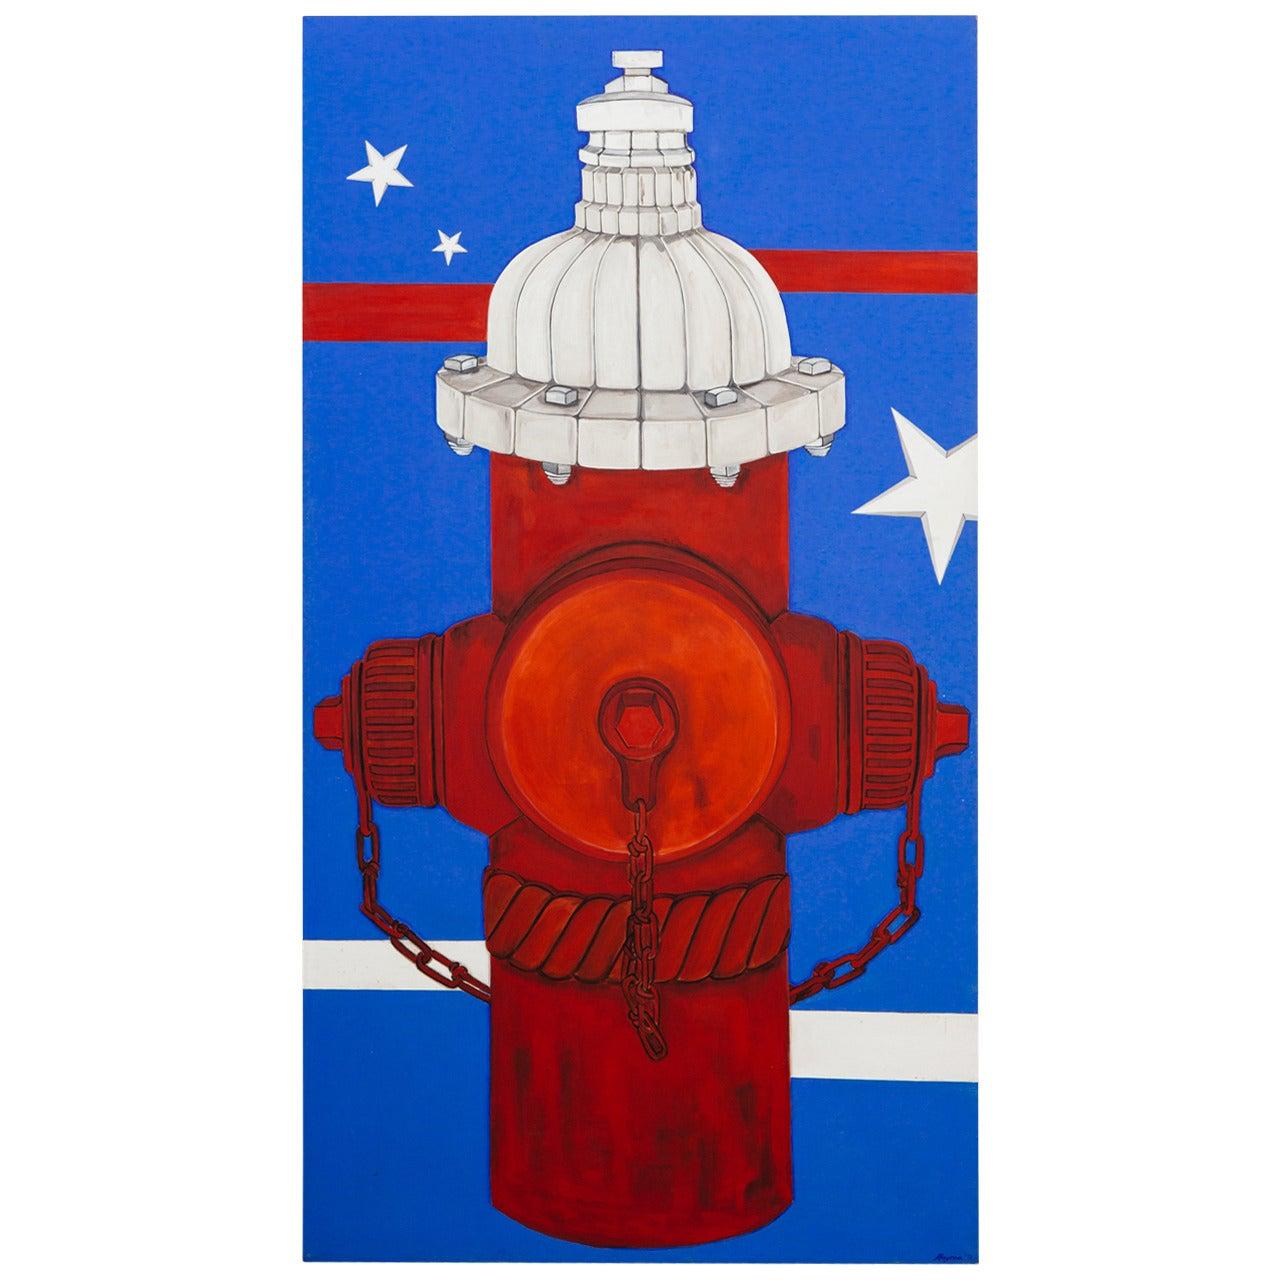 Huge 1971 Pop Art Oil Painting American Flag Capital Hill